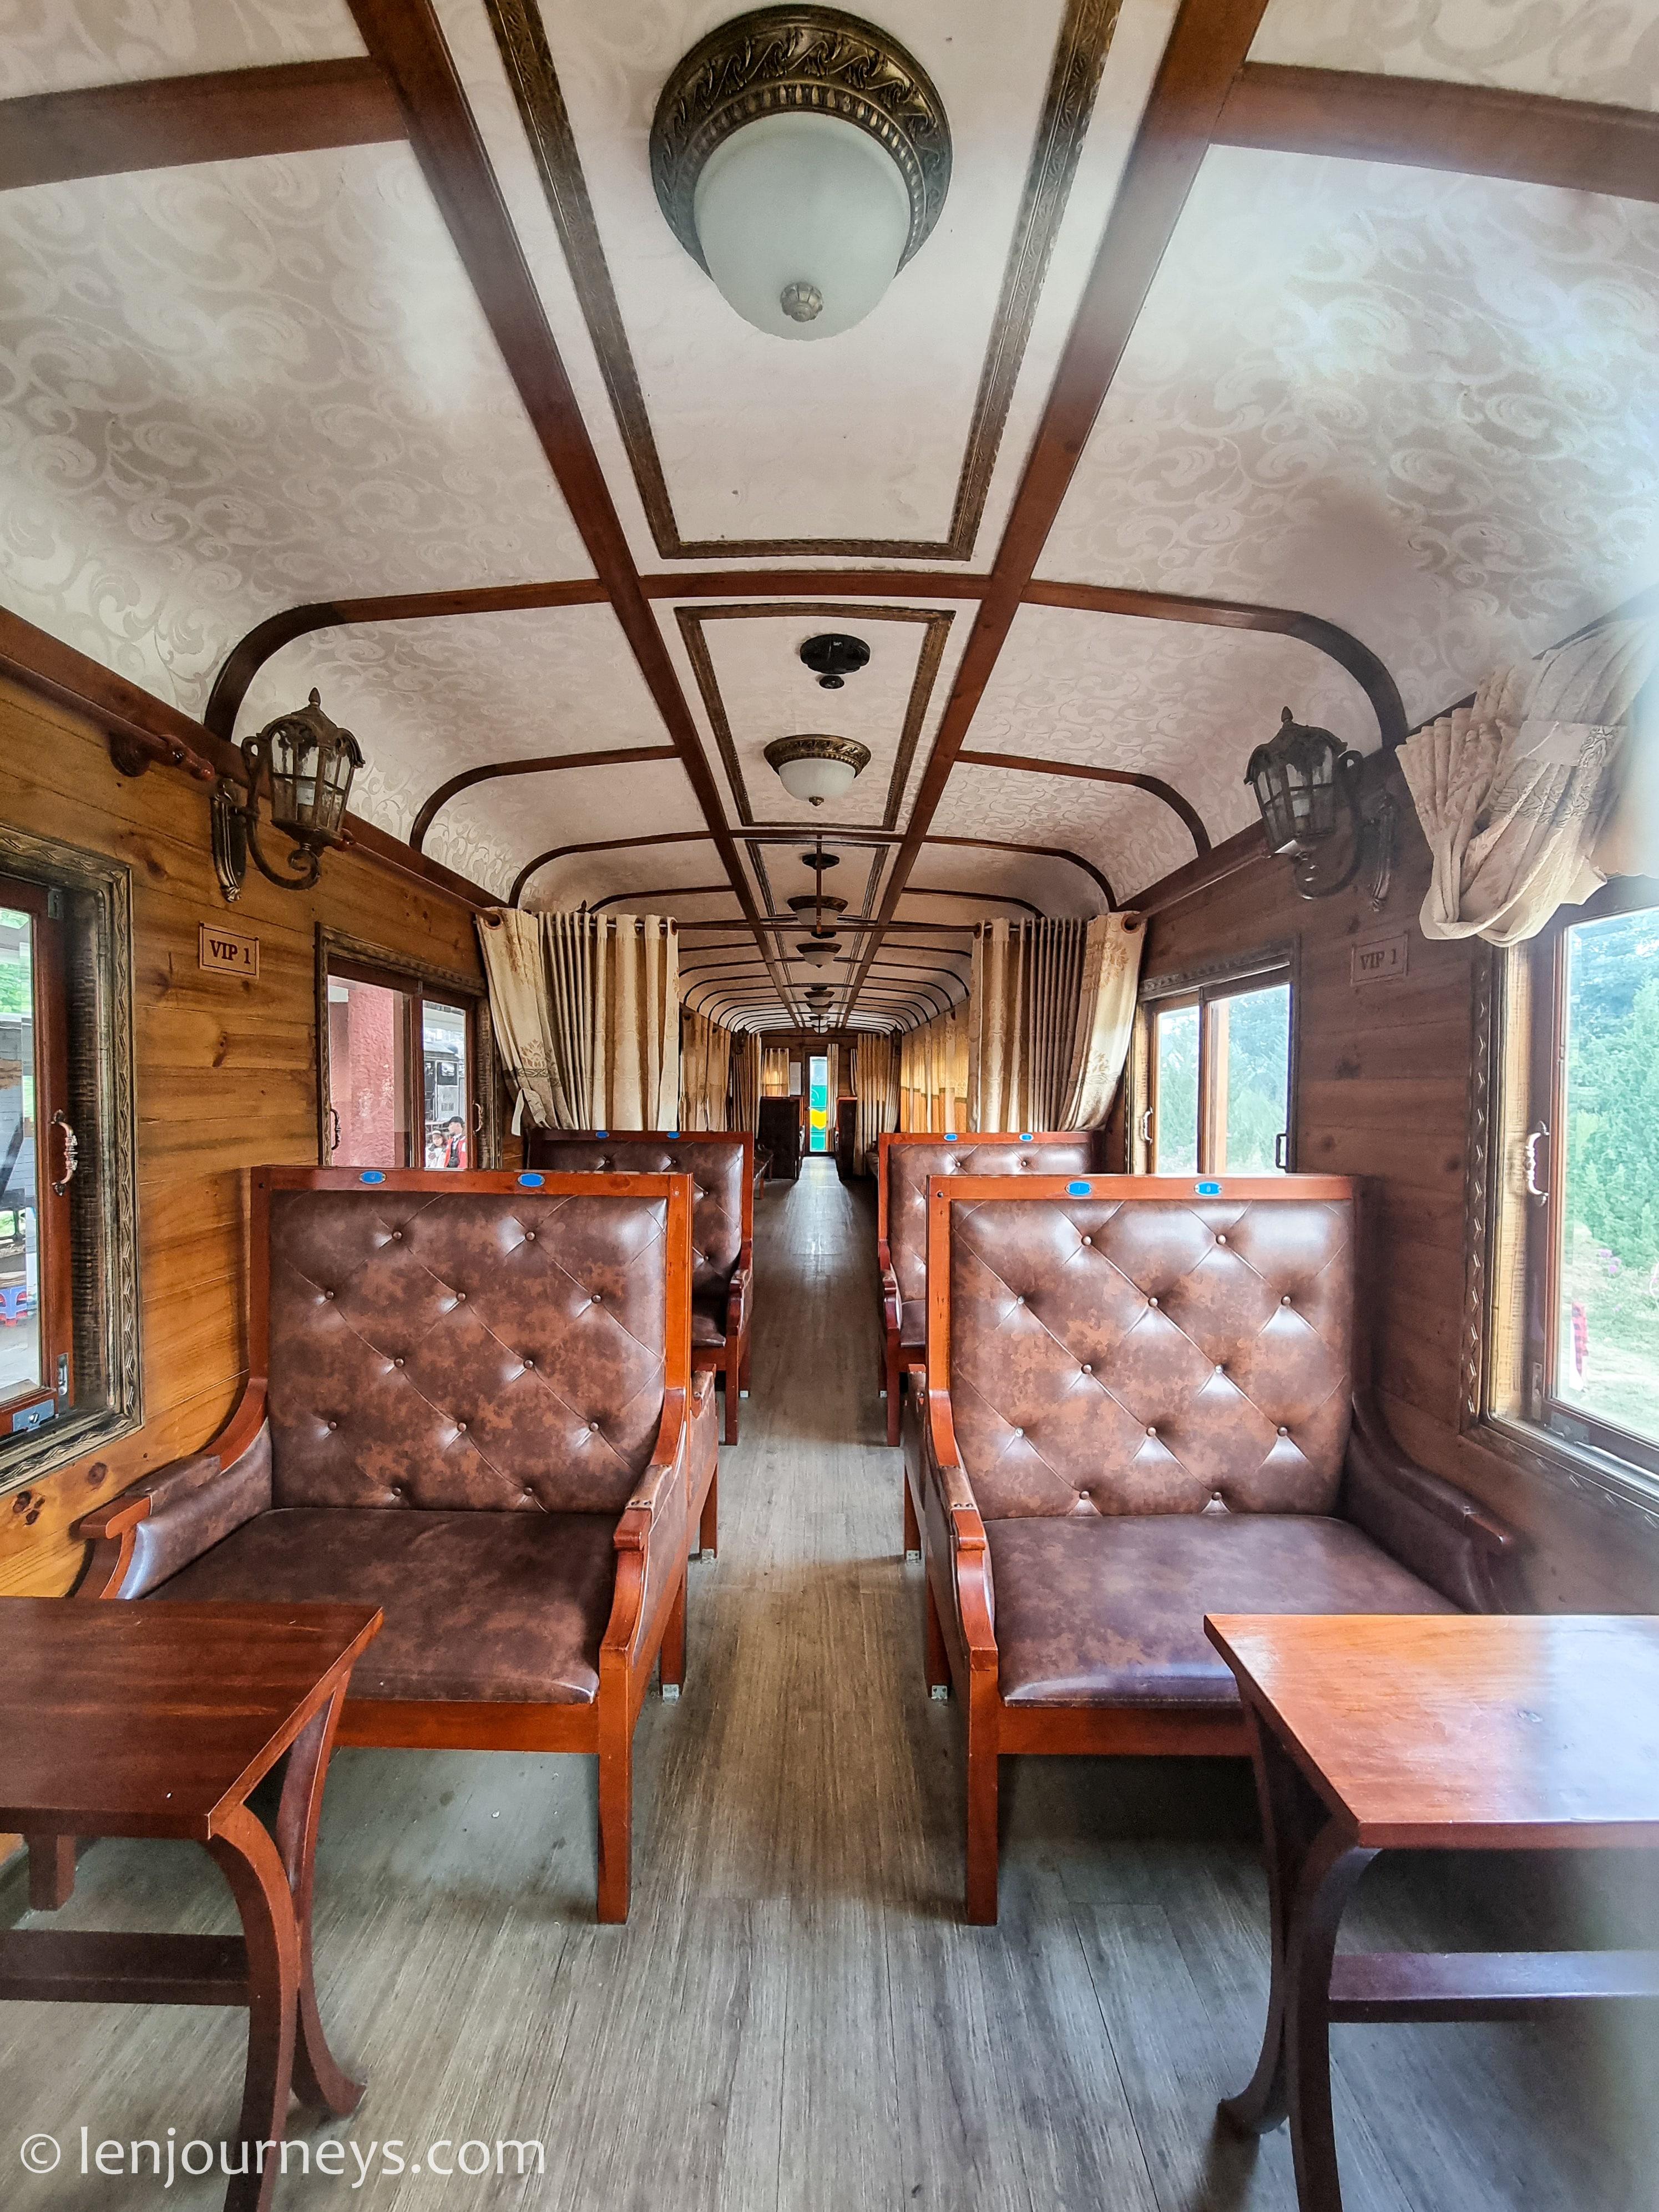 Inside the historic train